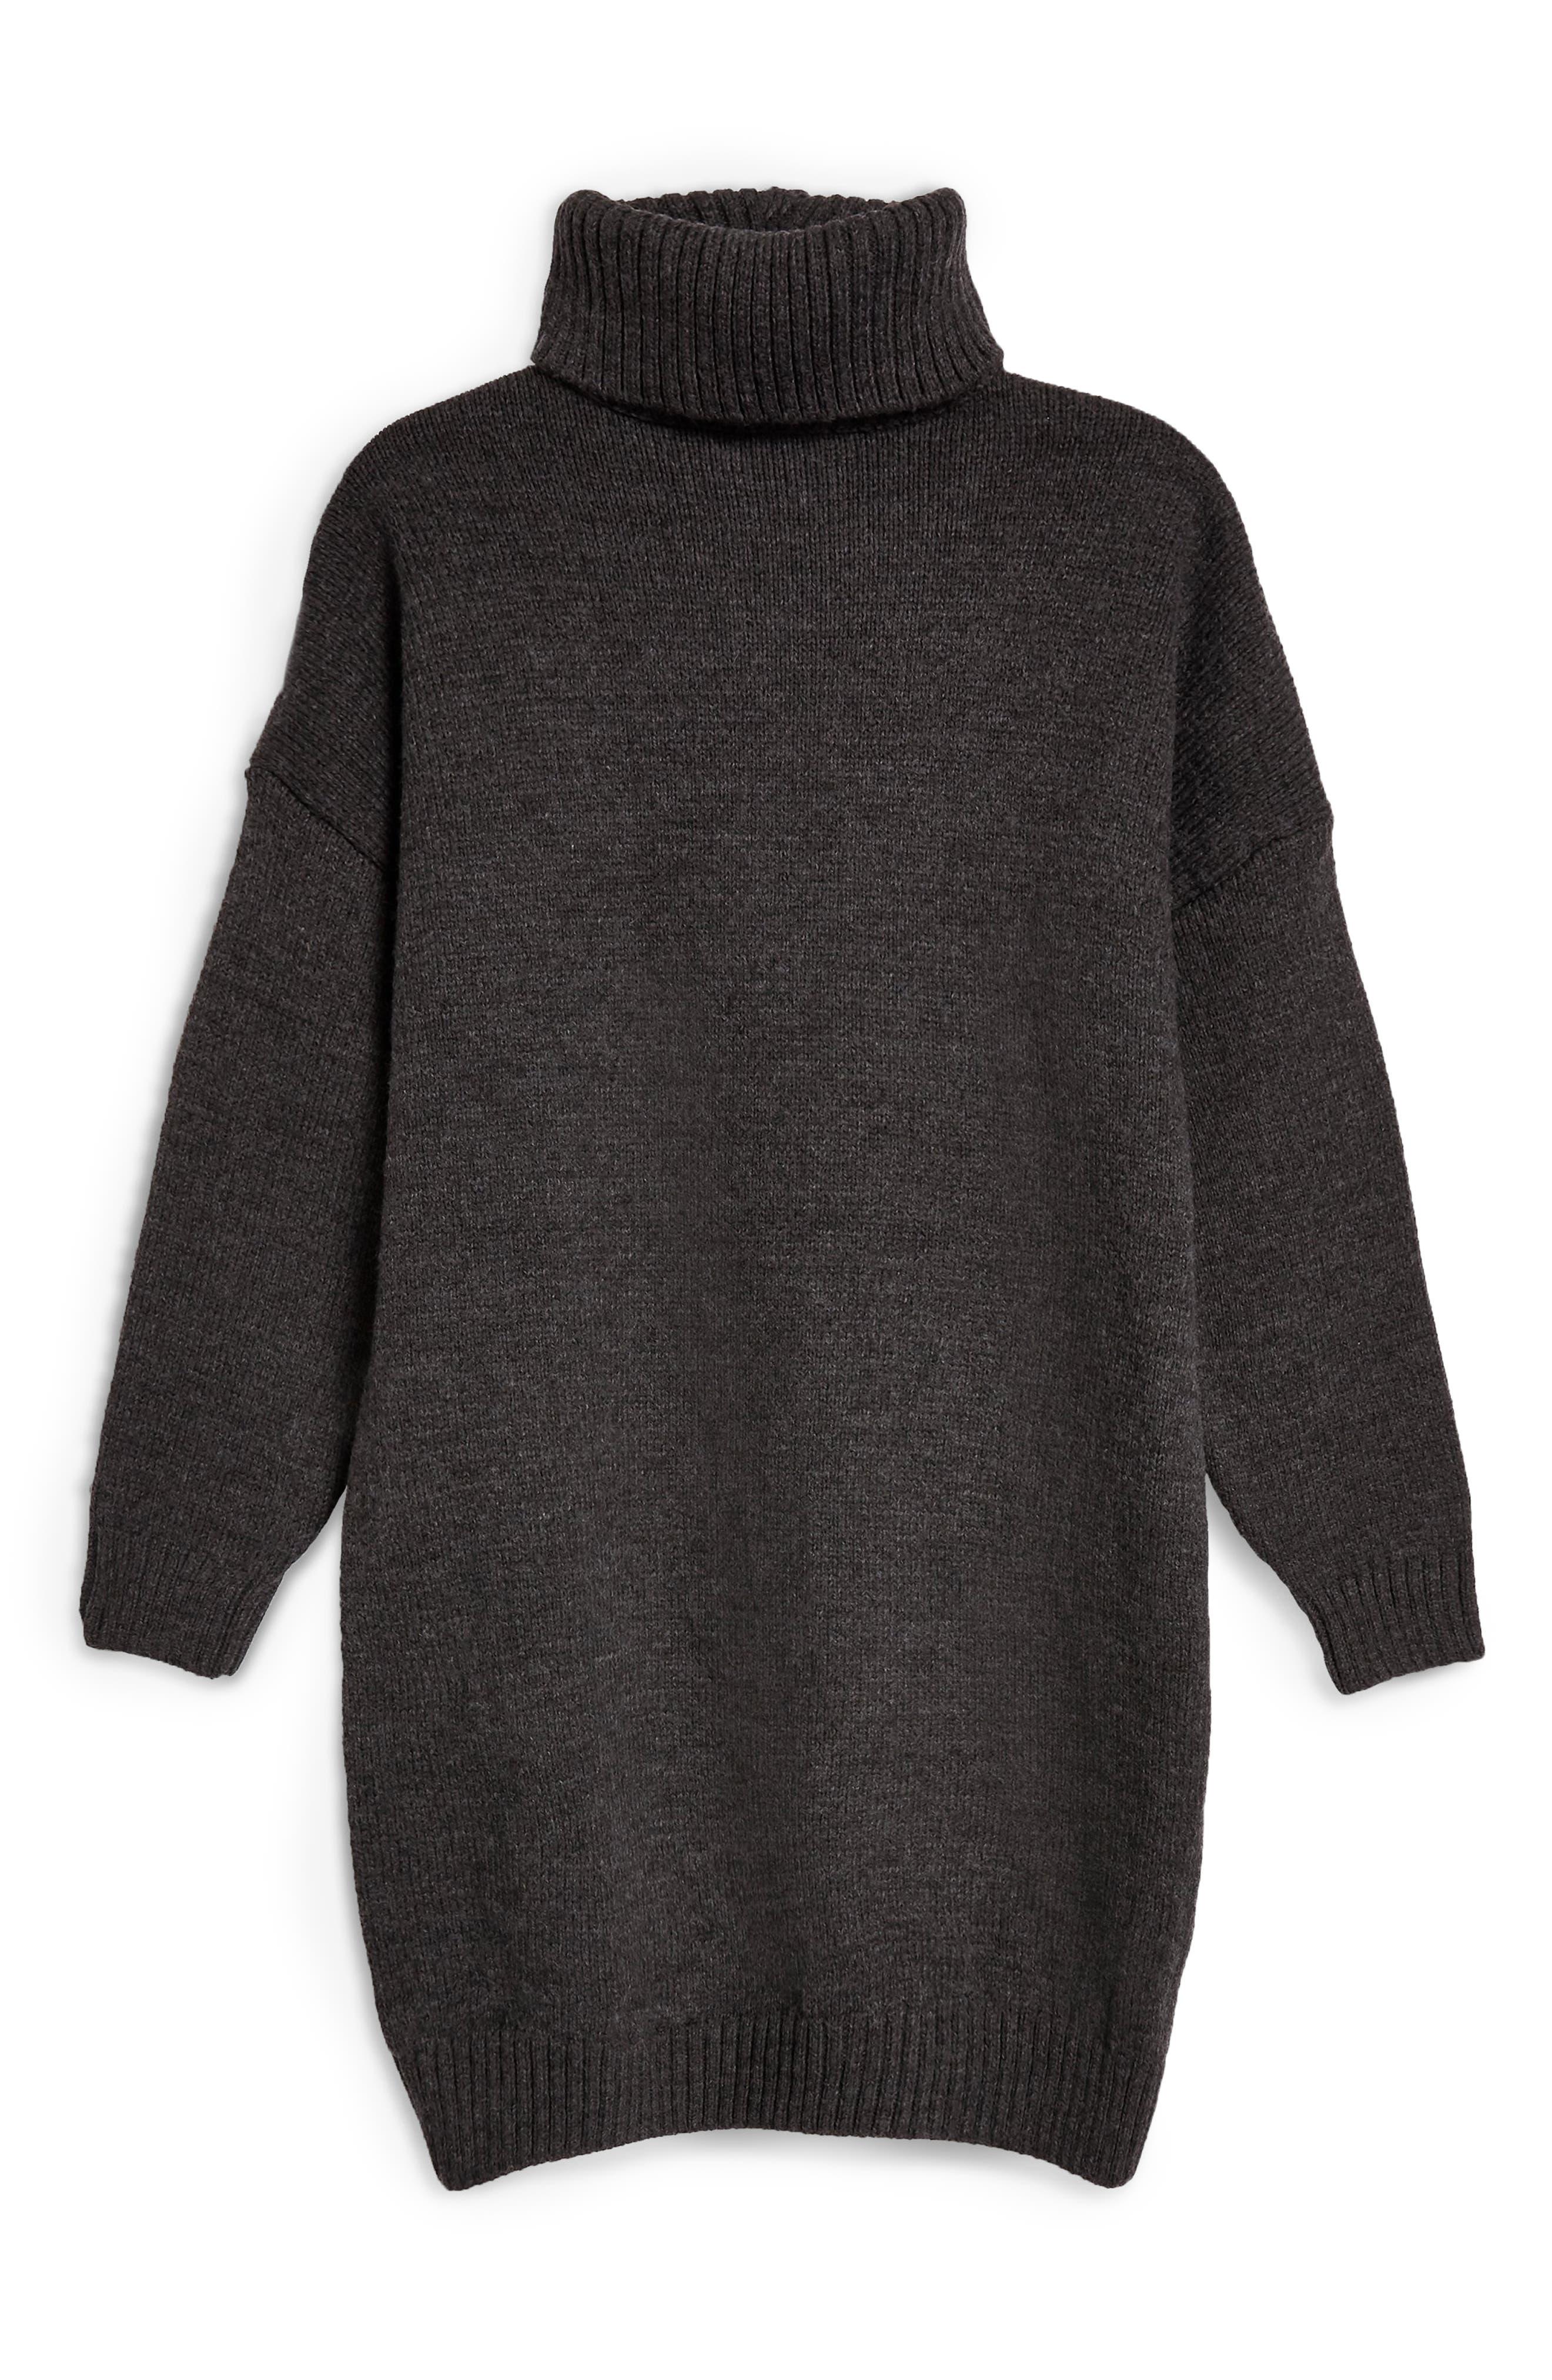 TOPSHOP, Turtleneck Sweater Dress, Alternate thumbnail 5, color, 021